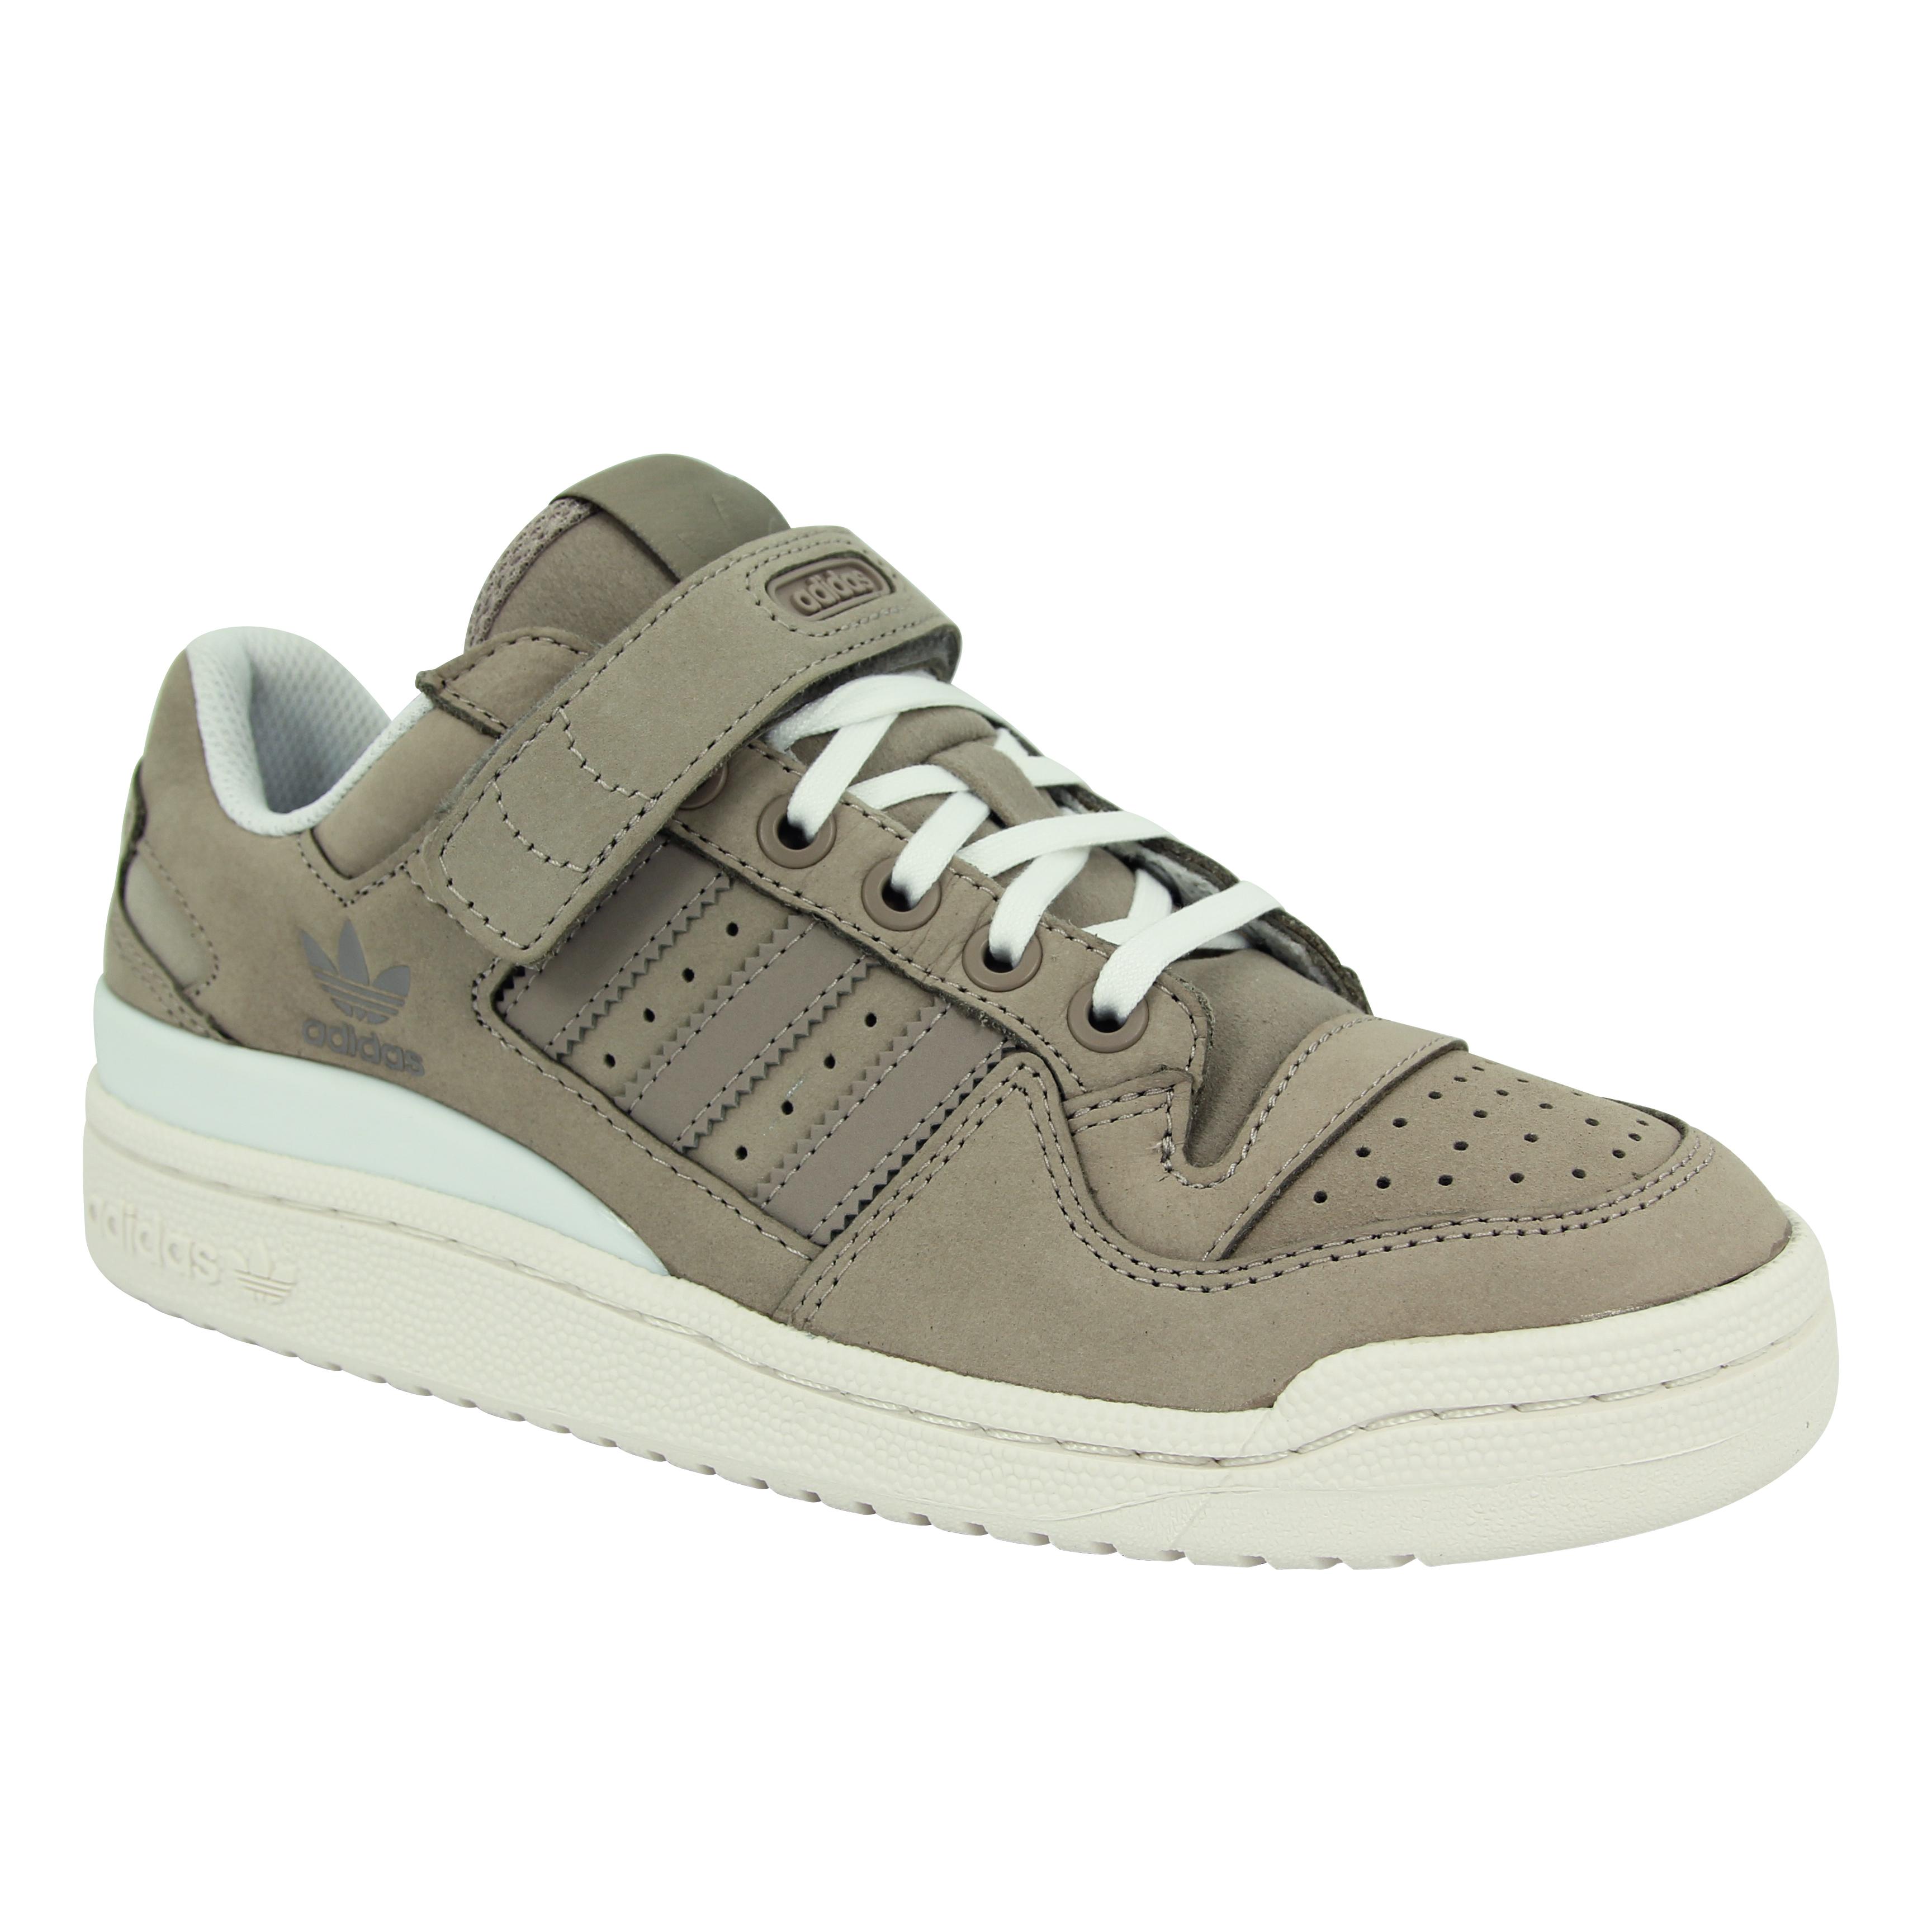 finest selection 1612a 05cd0 adidas Originals FORUM LOW Cuir Chaussures Mode Sneakers Unisex 2 2 sur 6  ...